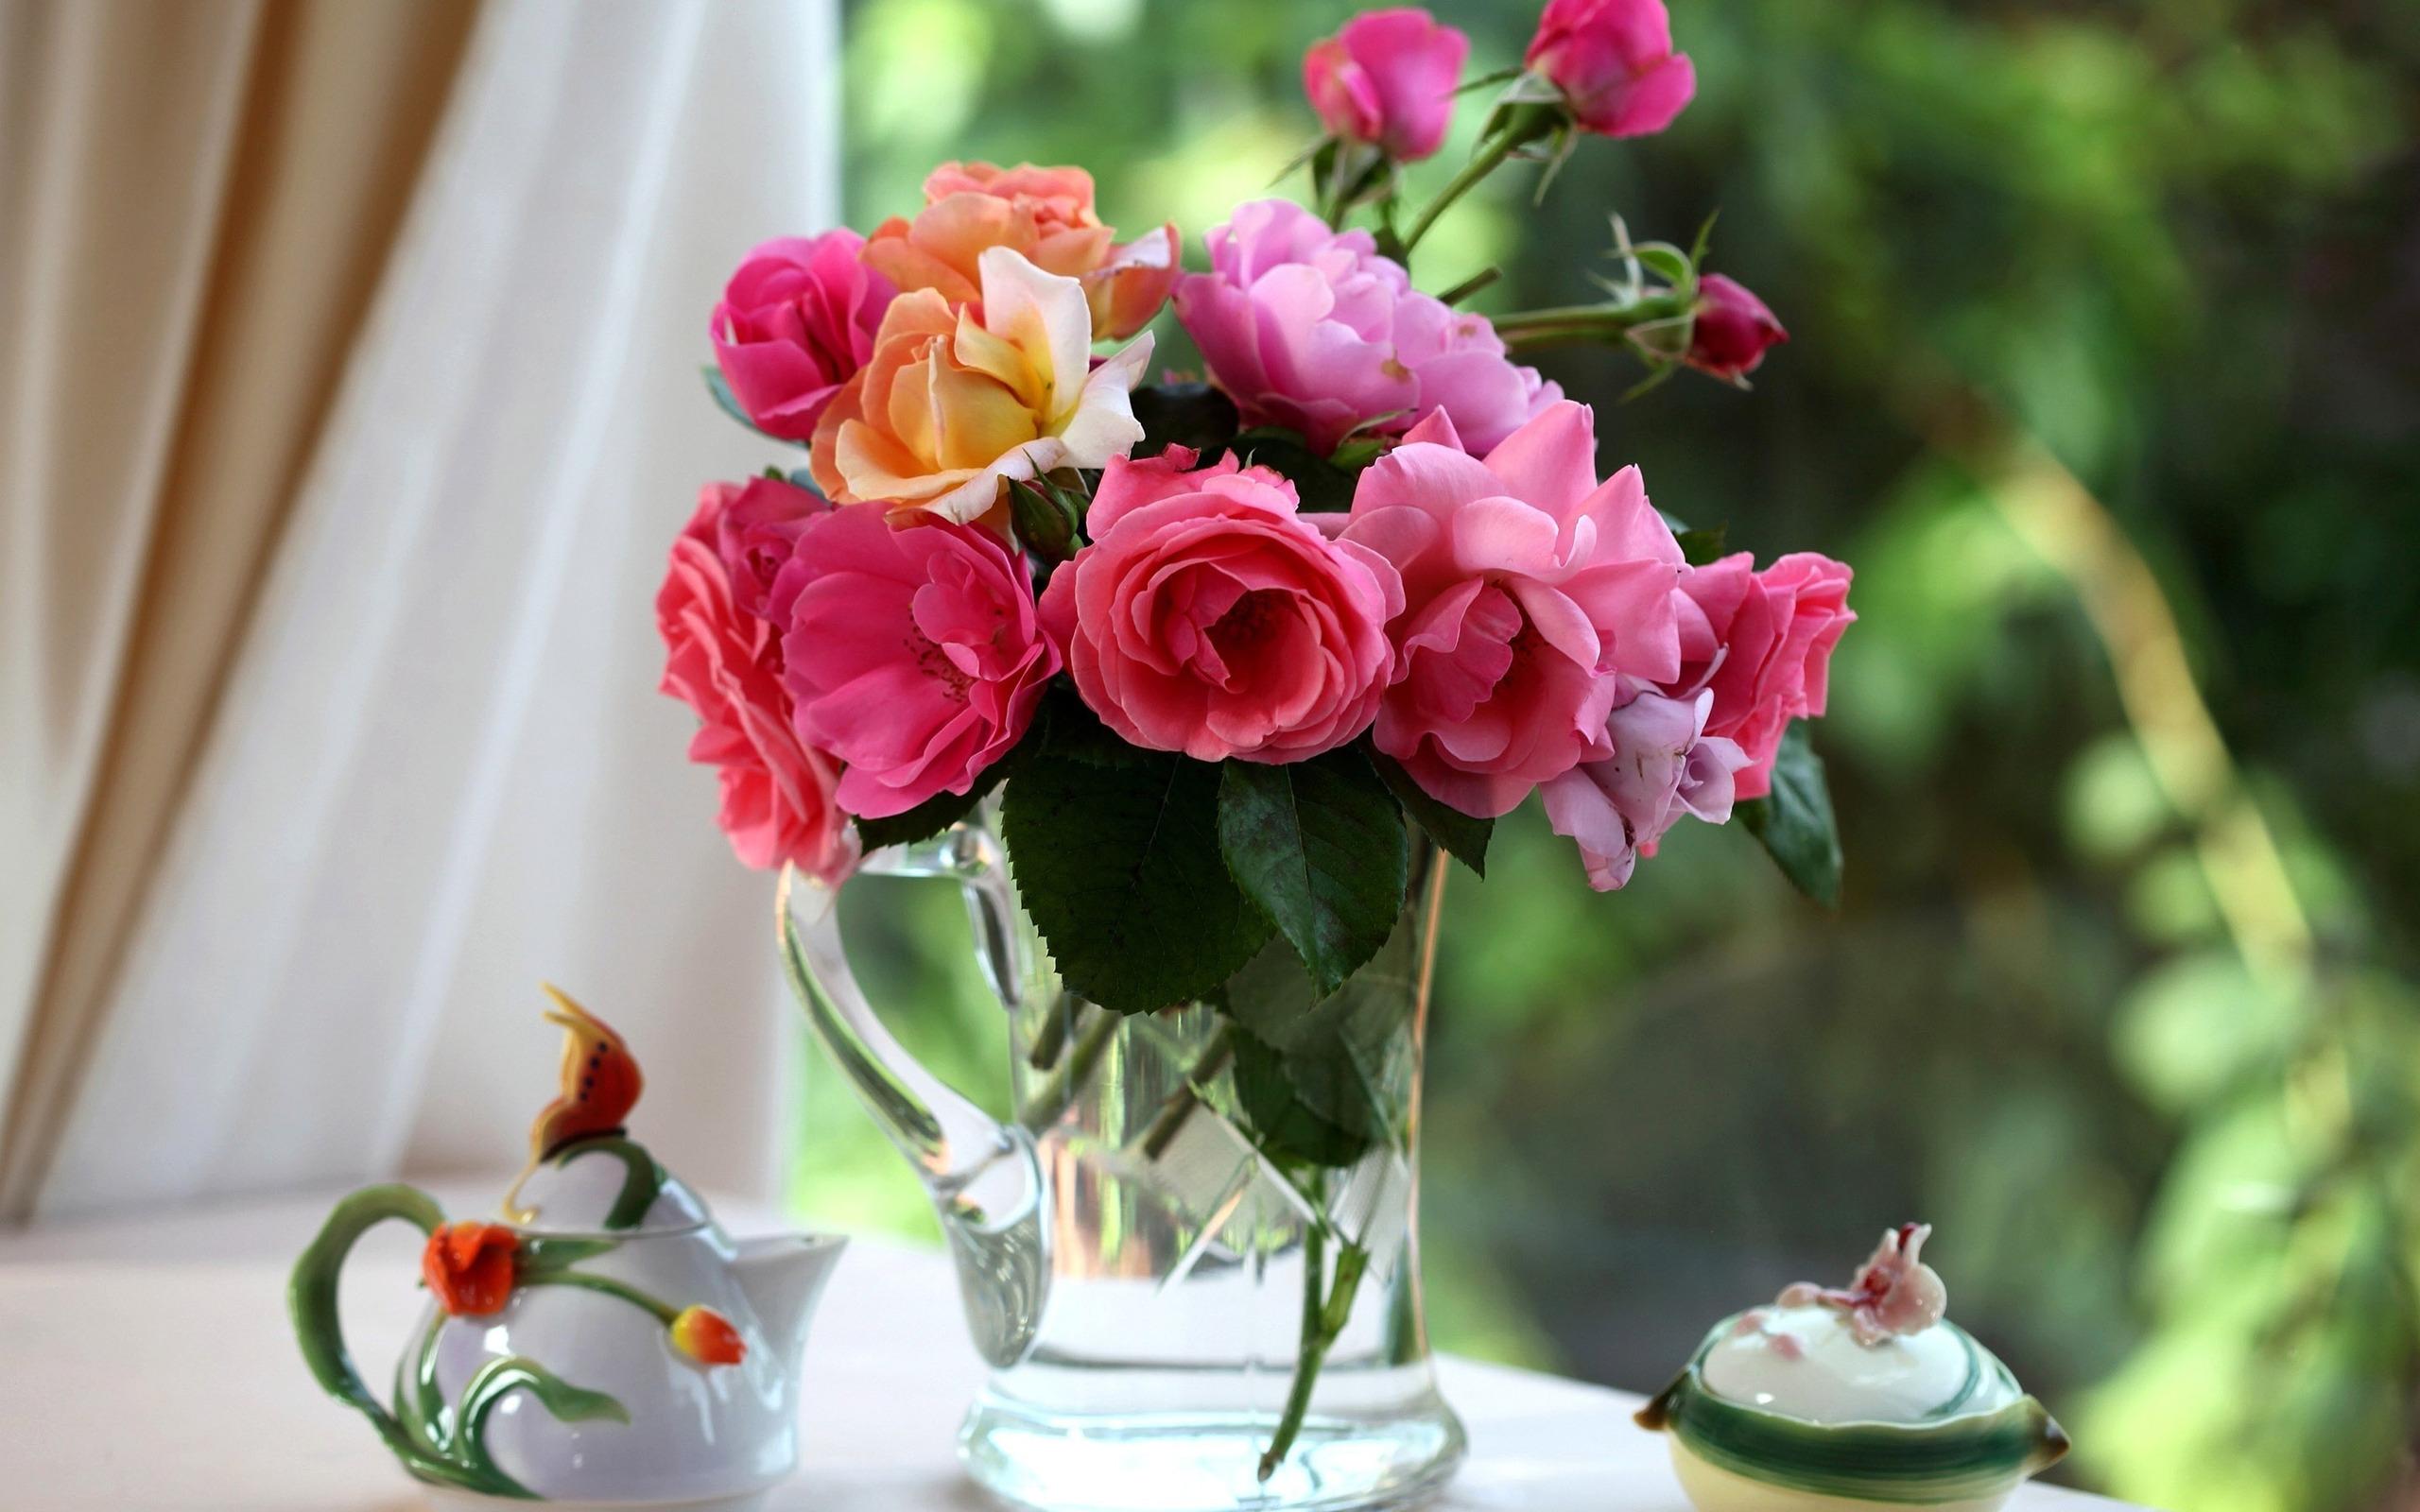 Roses in the vase Wallpaper 22809 2560x1600